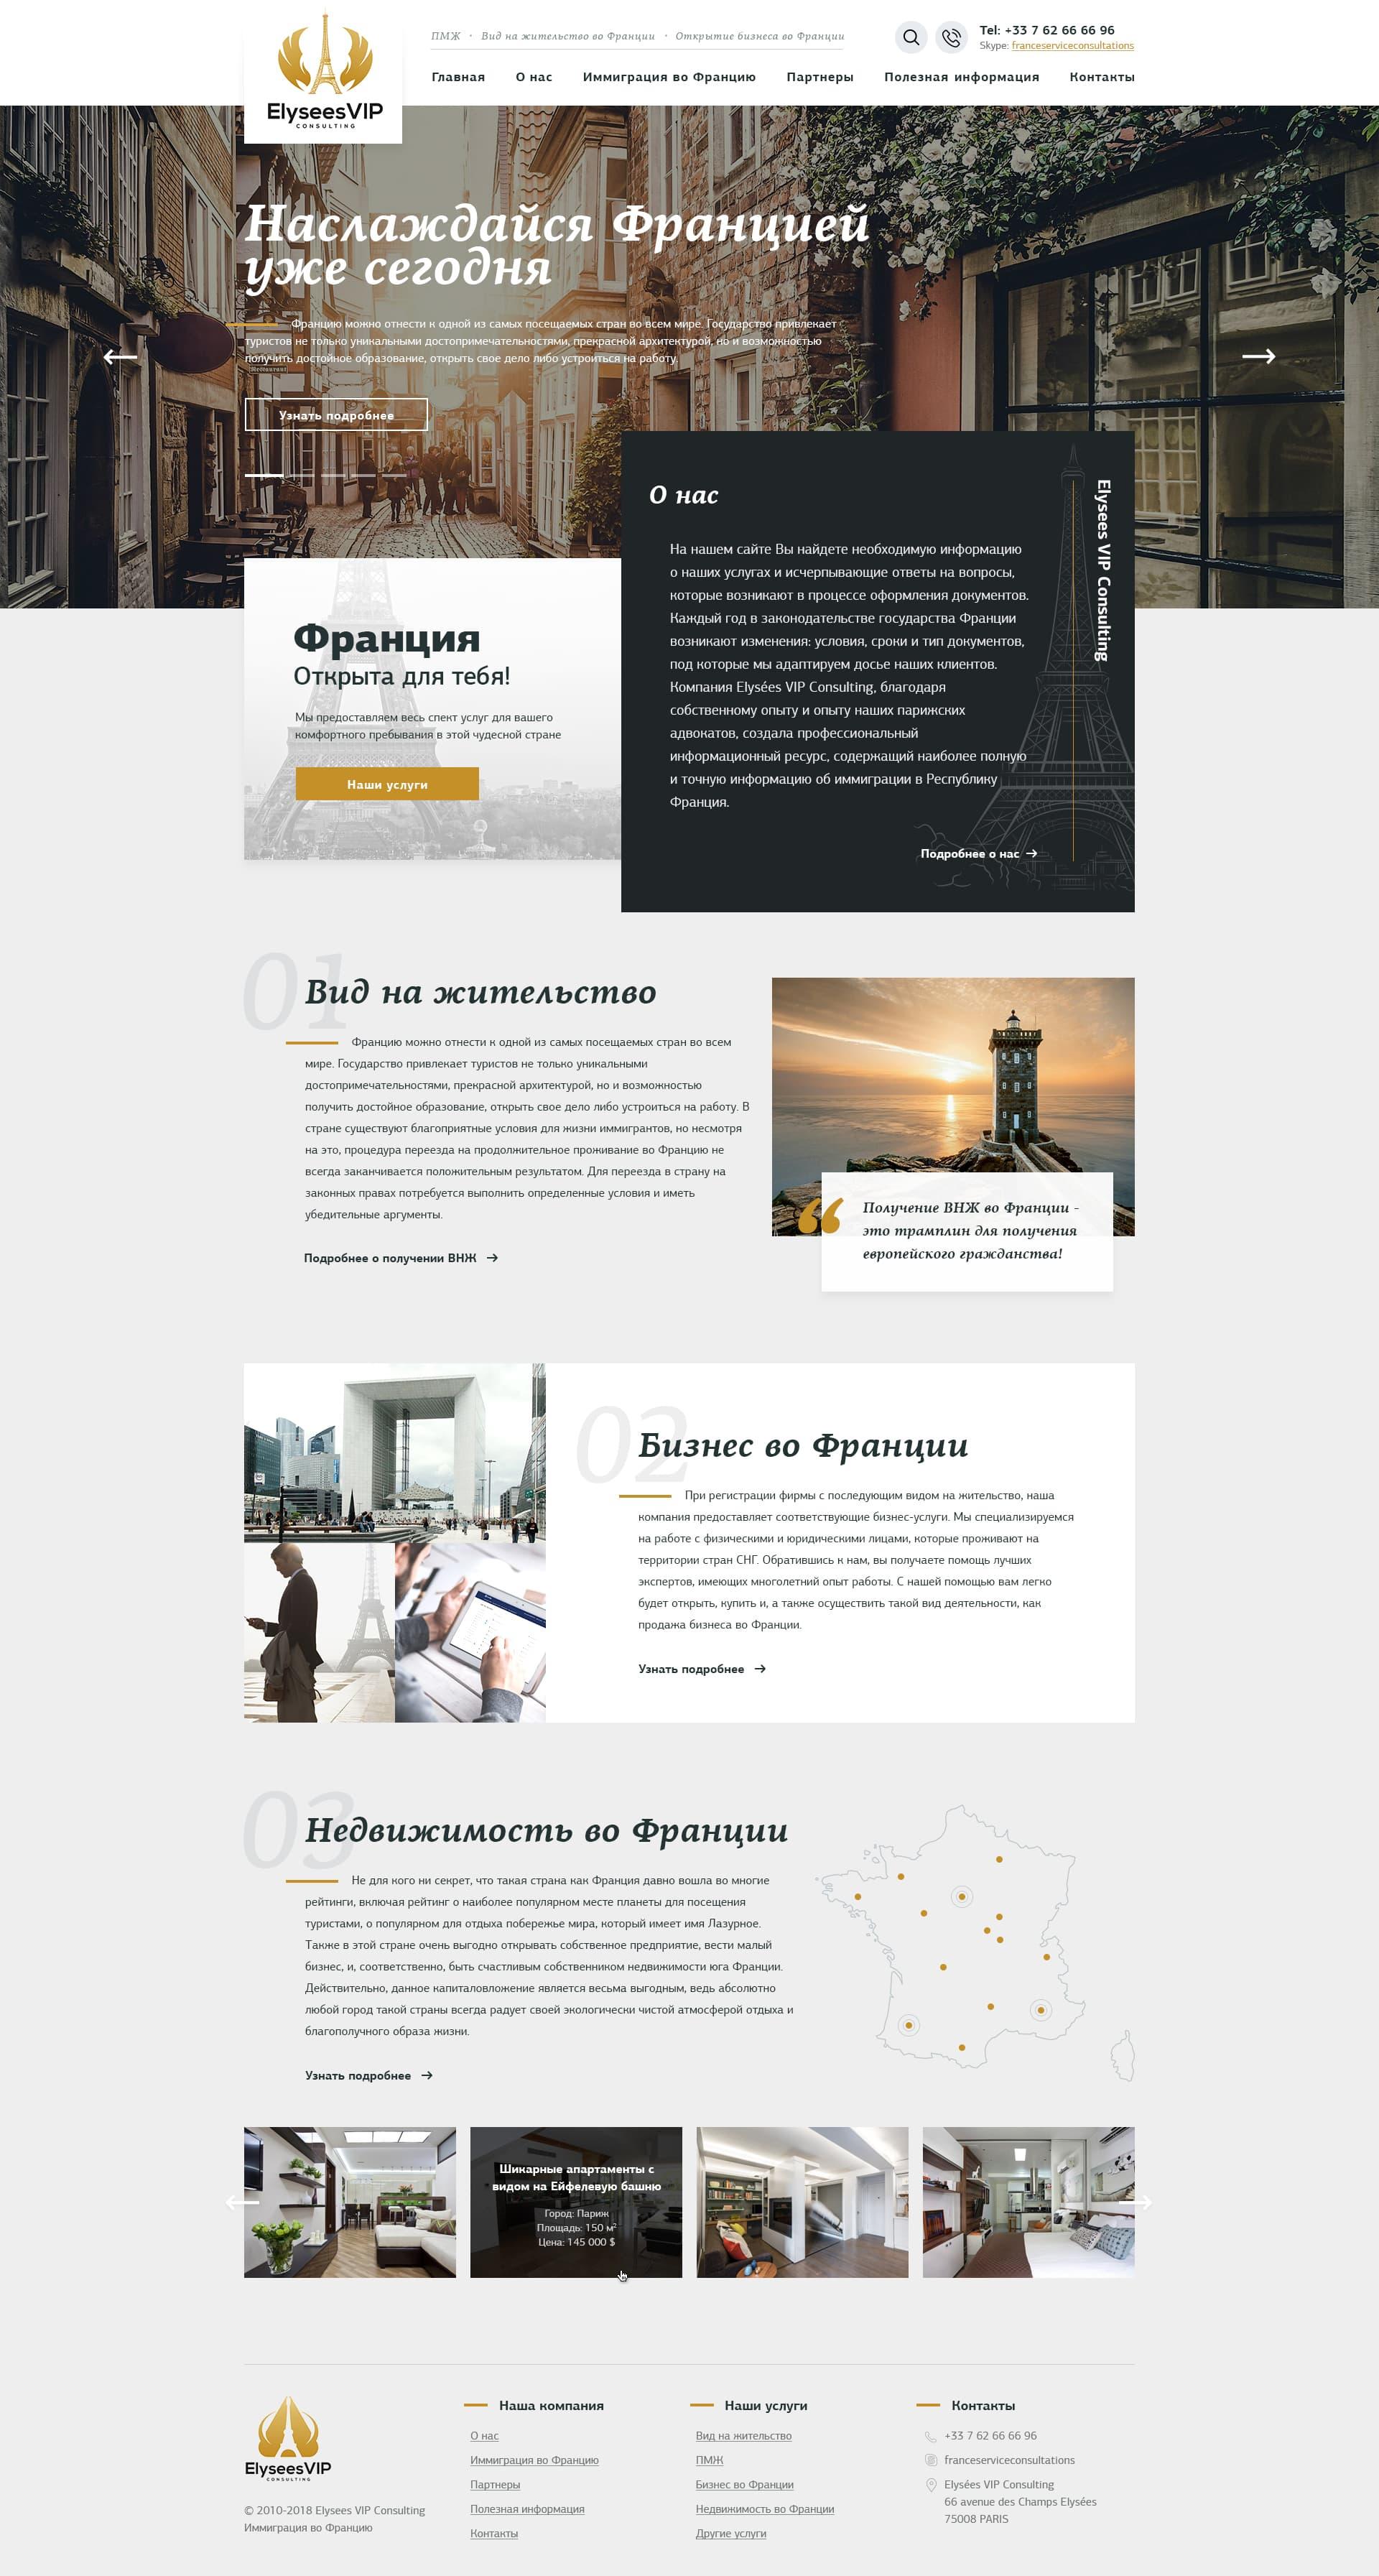 https://vladimir-alexandrov.com/wp-content/uploads/2018/07/EVC_main3-min.jpg